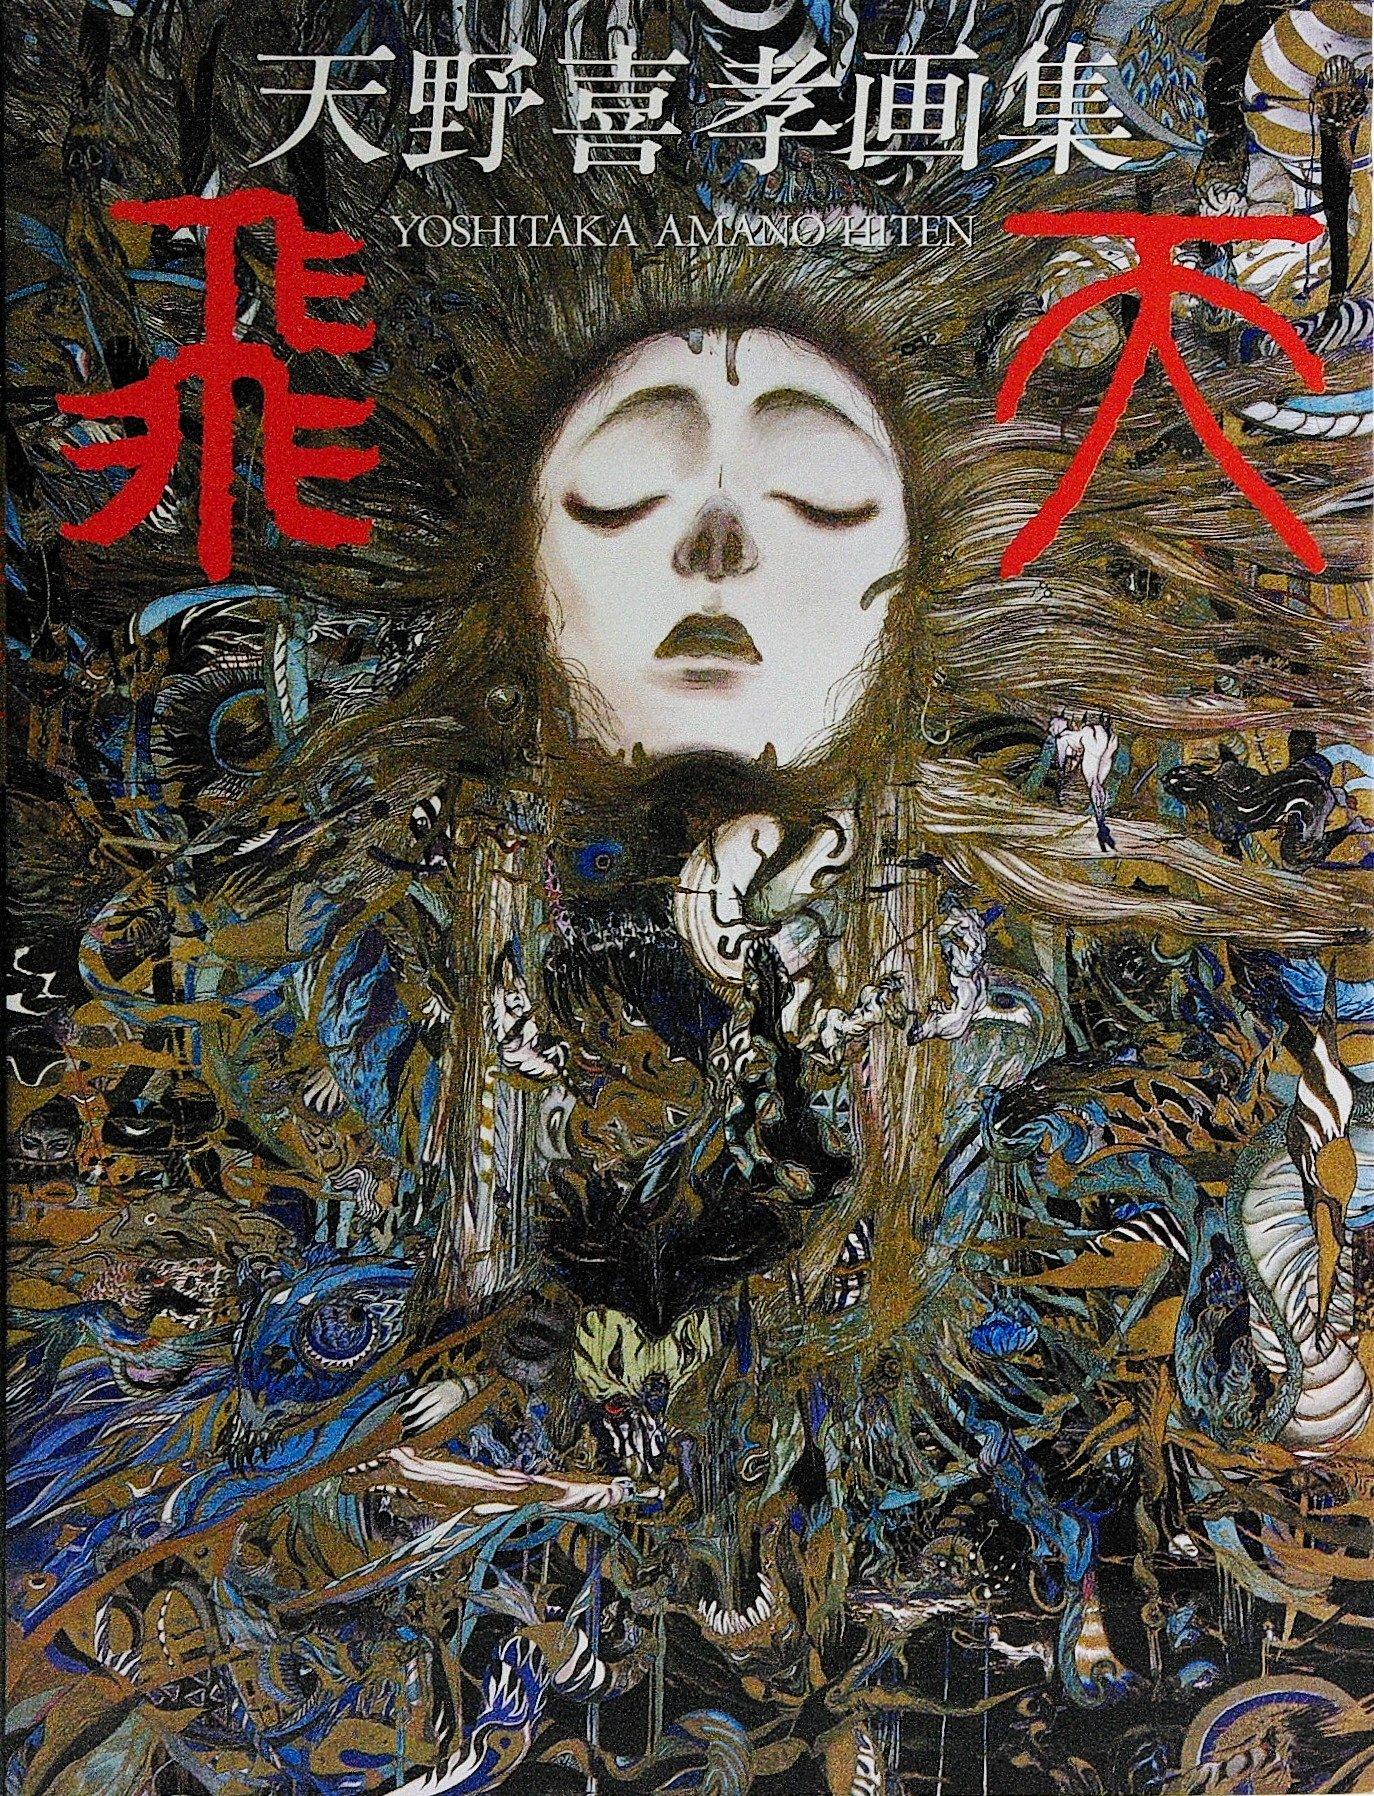 the art of yoshitaka amano hiten japanese language text